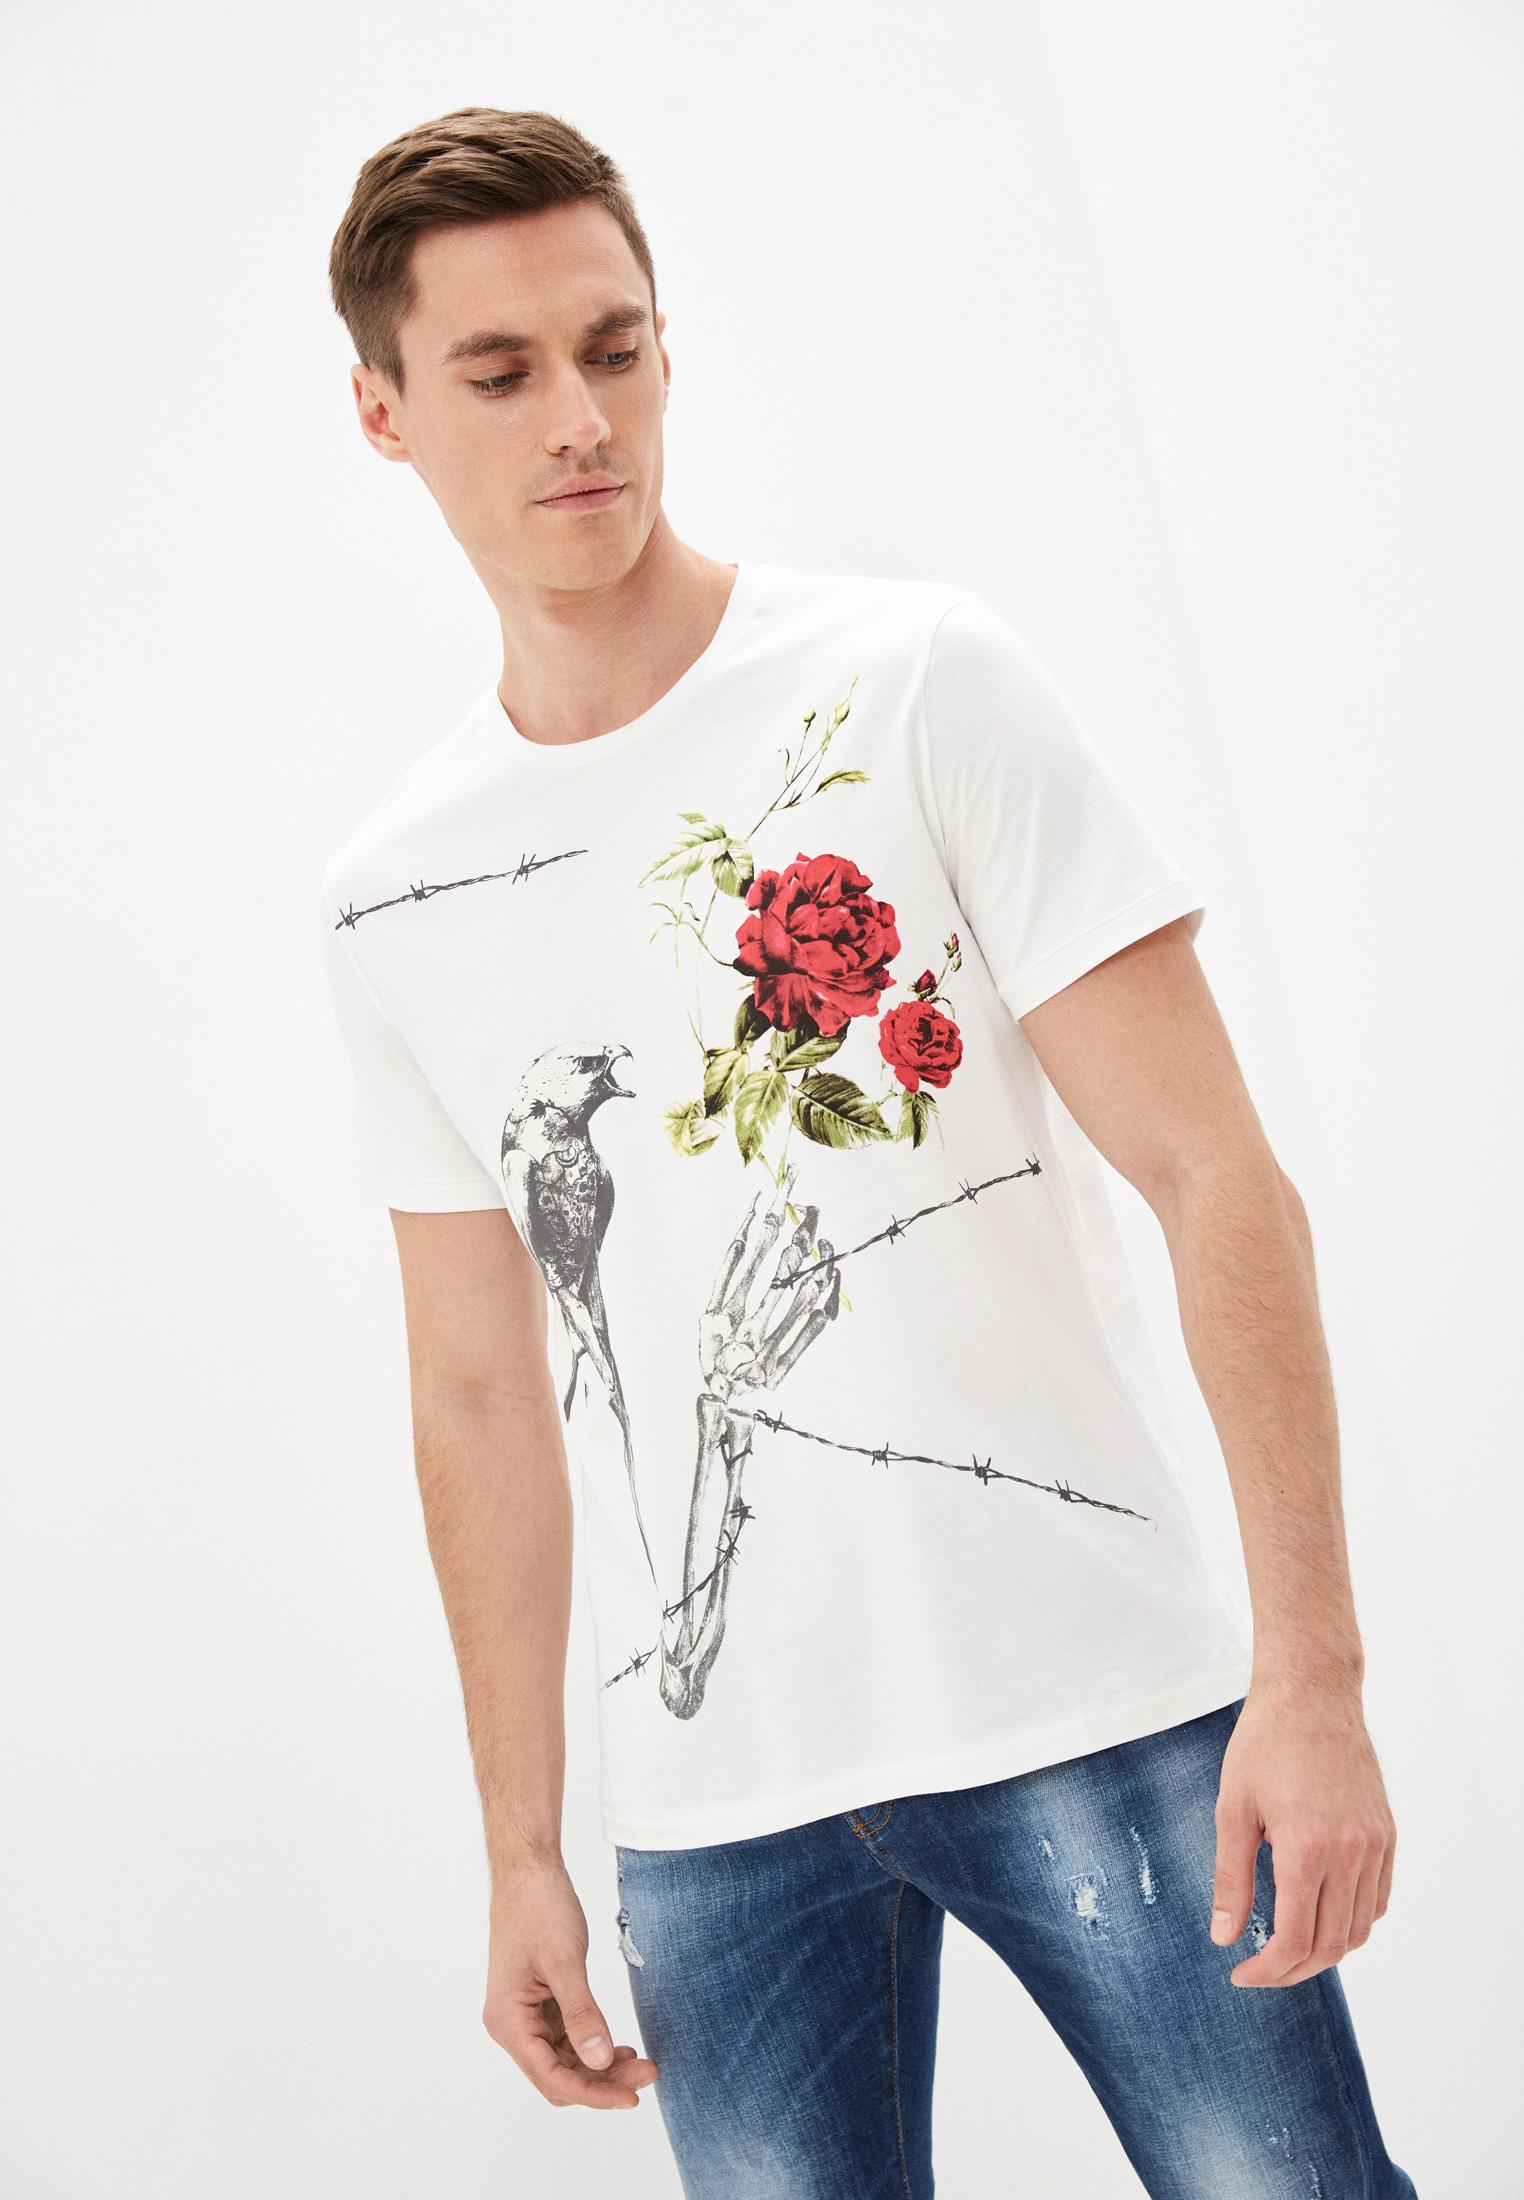 Мужская футболка Just Cavalli (Джаст Кавалли) S01GC0432N20663101